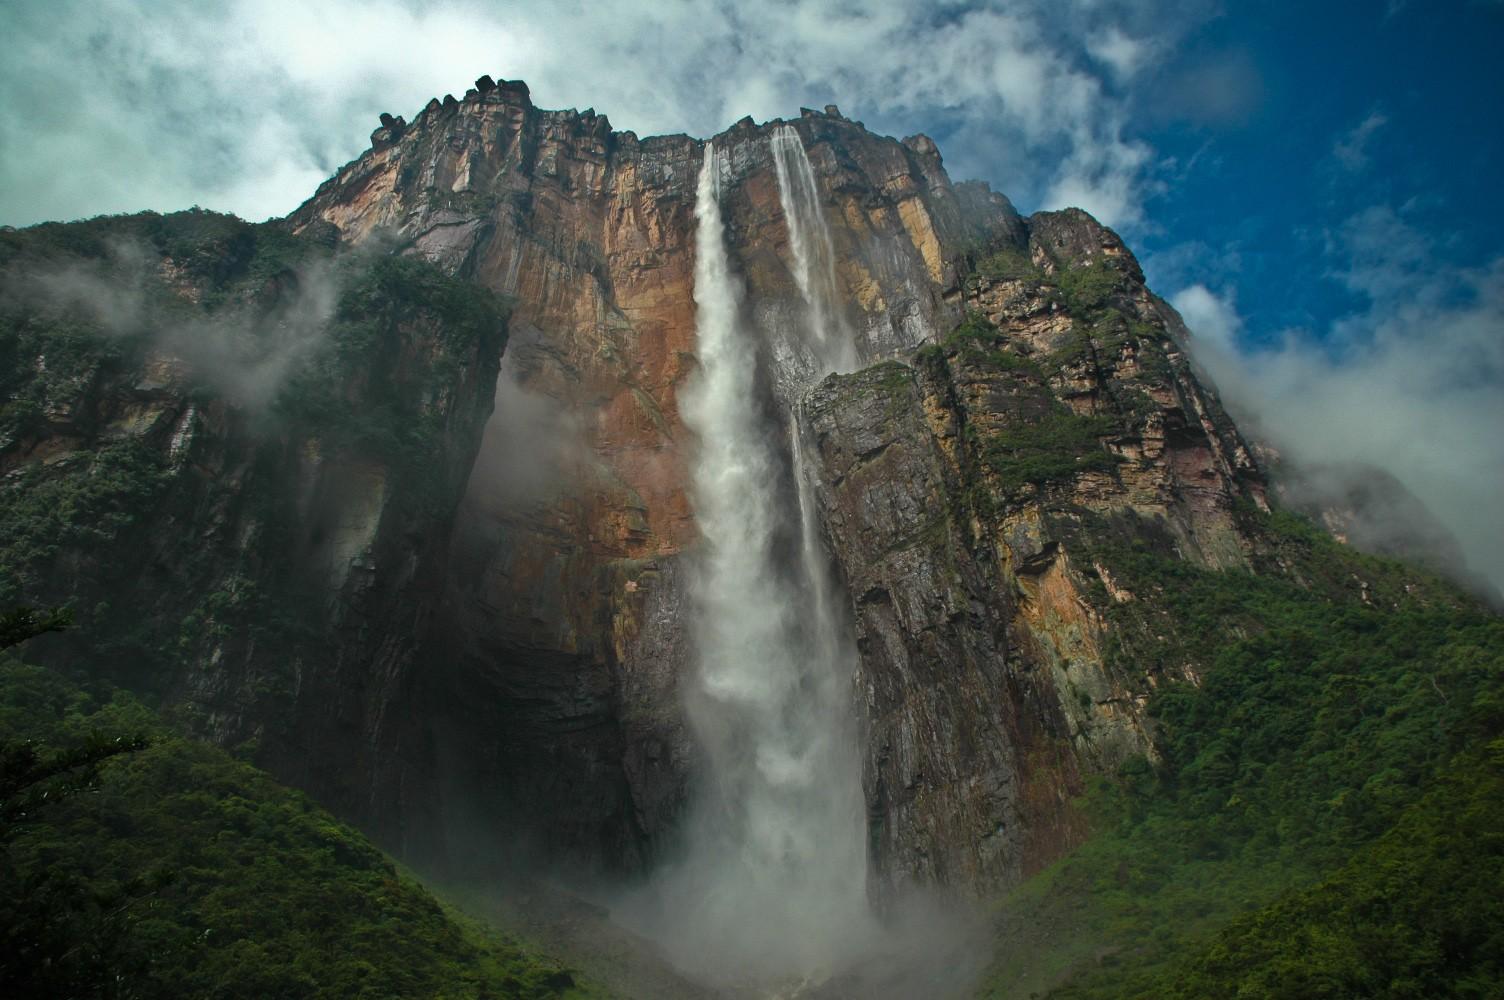 Angel Falls / Salto Angel, VEnezuela. Photo by ENT108 via Flickr. CC